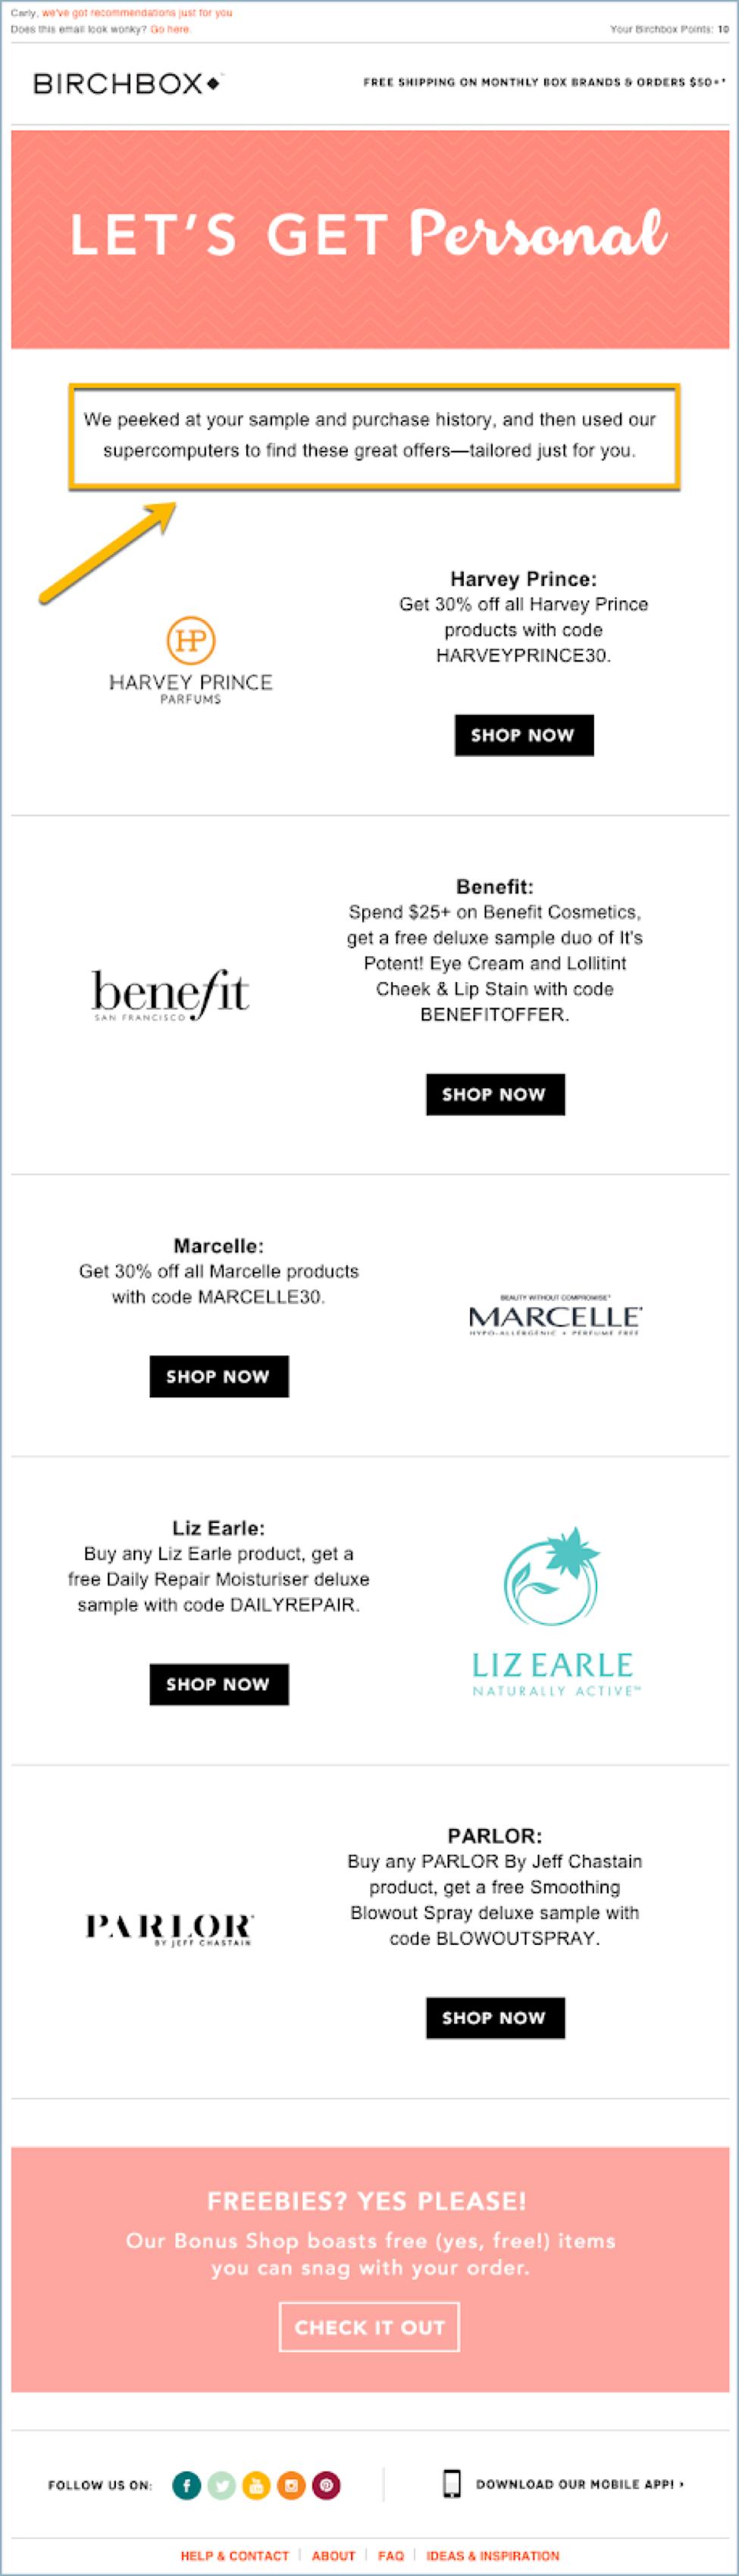 Birchbox - eCommerce Email Marketing